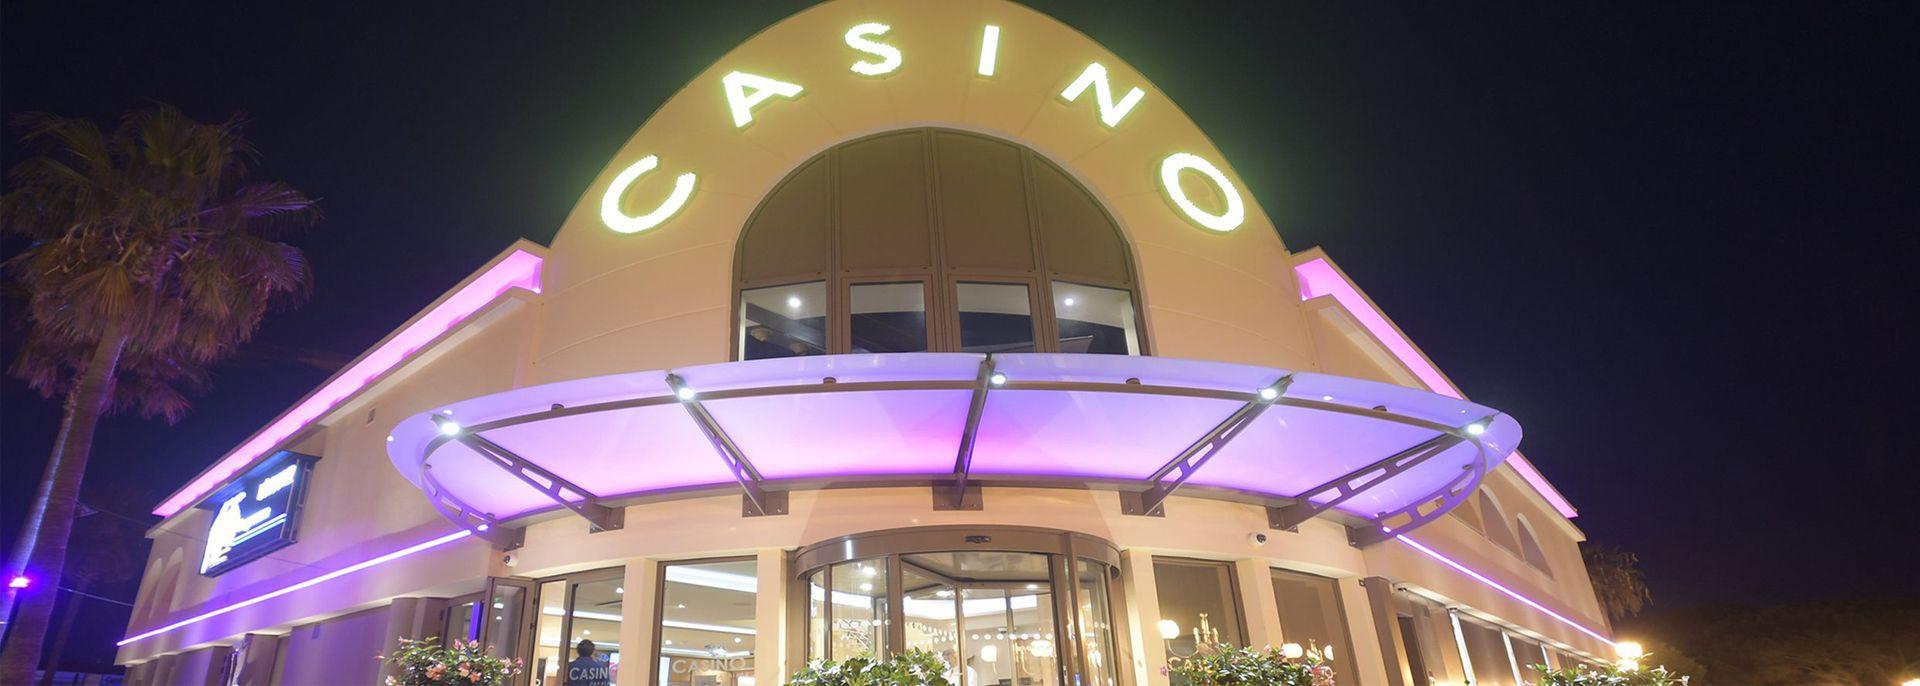 Real money safe online casino australia